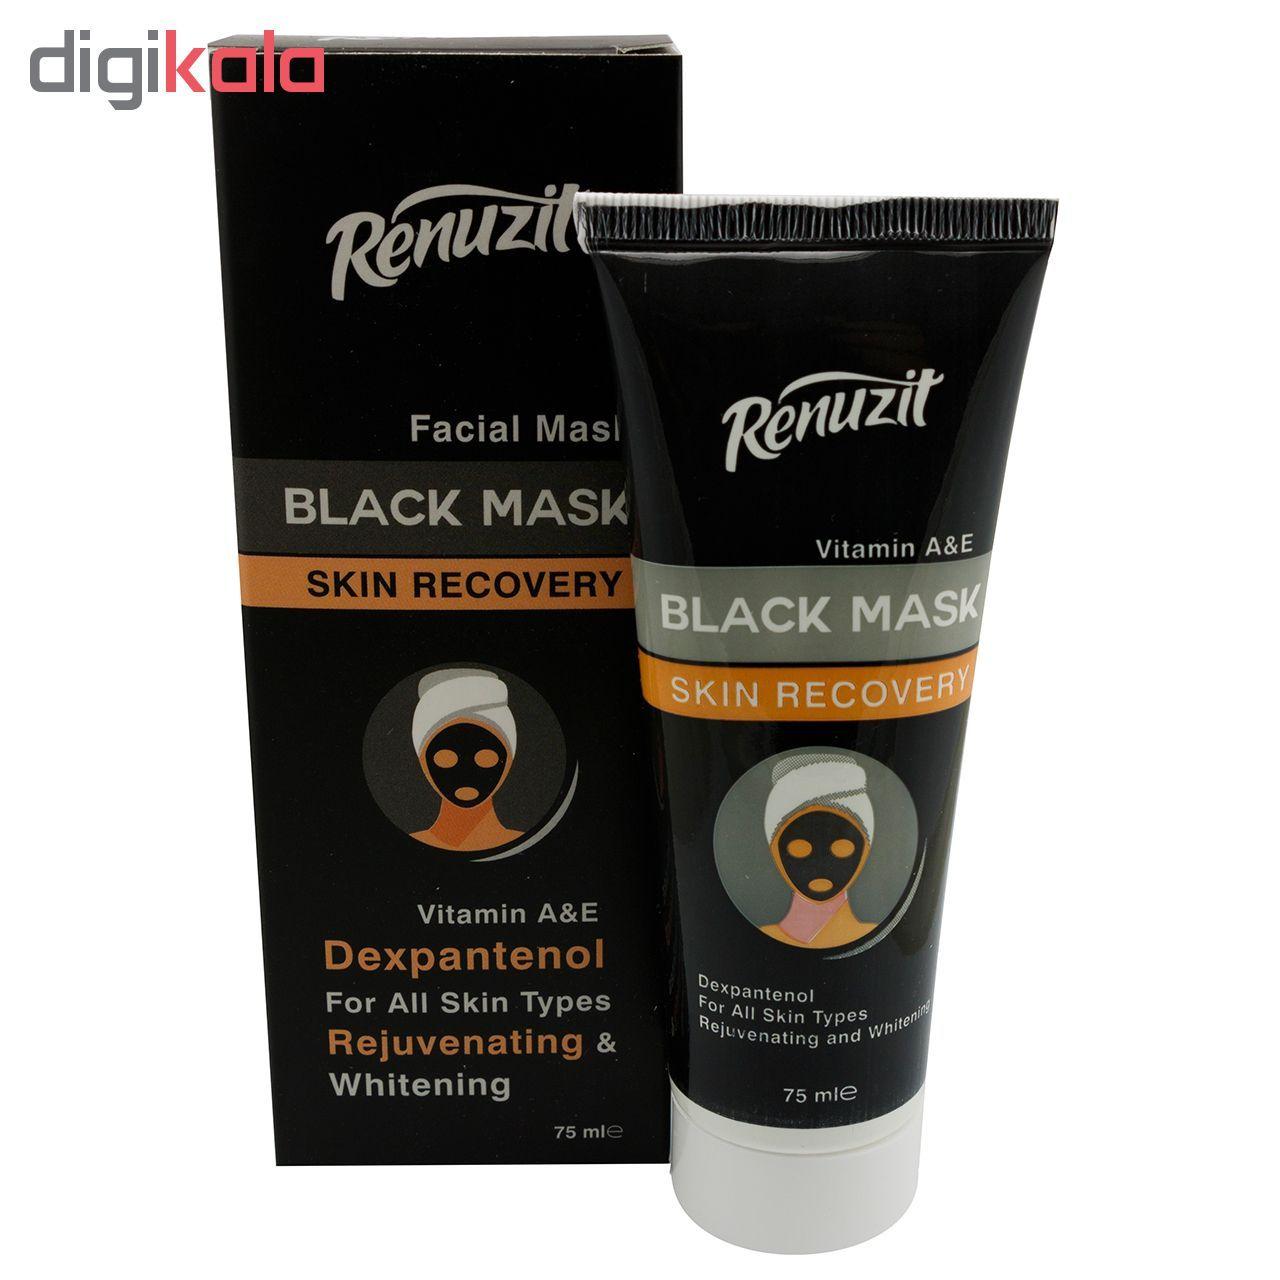 ماسک صورت رینو زیت مدل Black mask carbon active حجم 75 میلی لیتر main 1 2